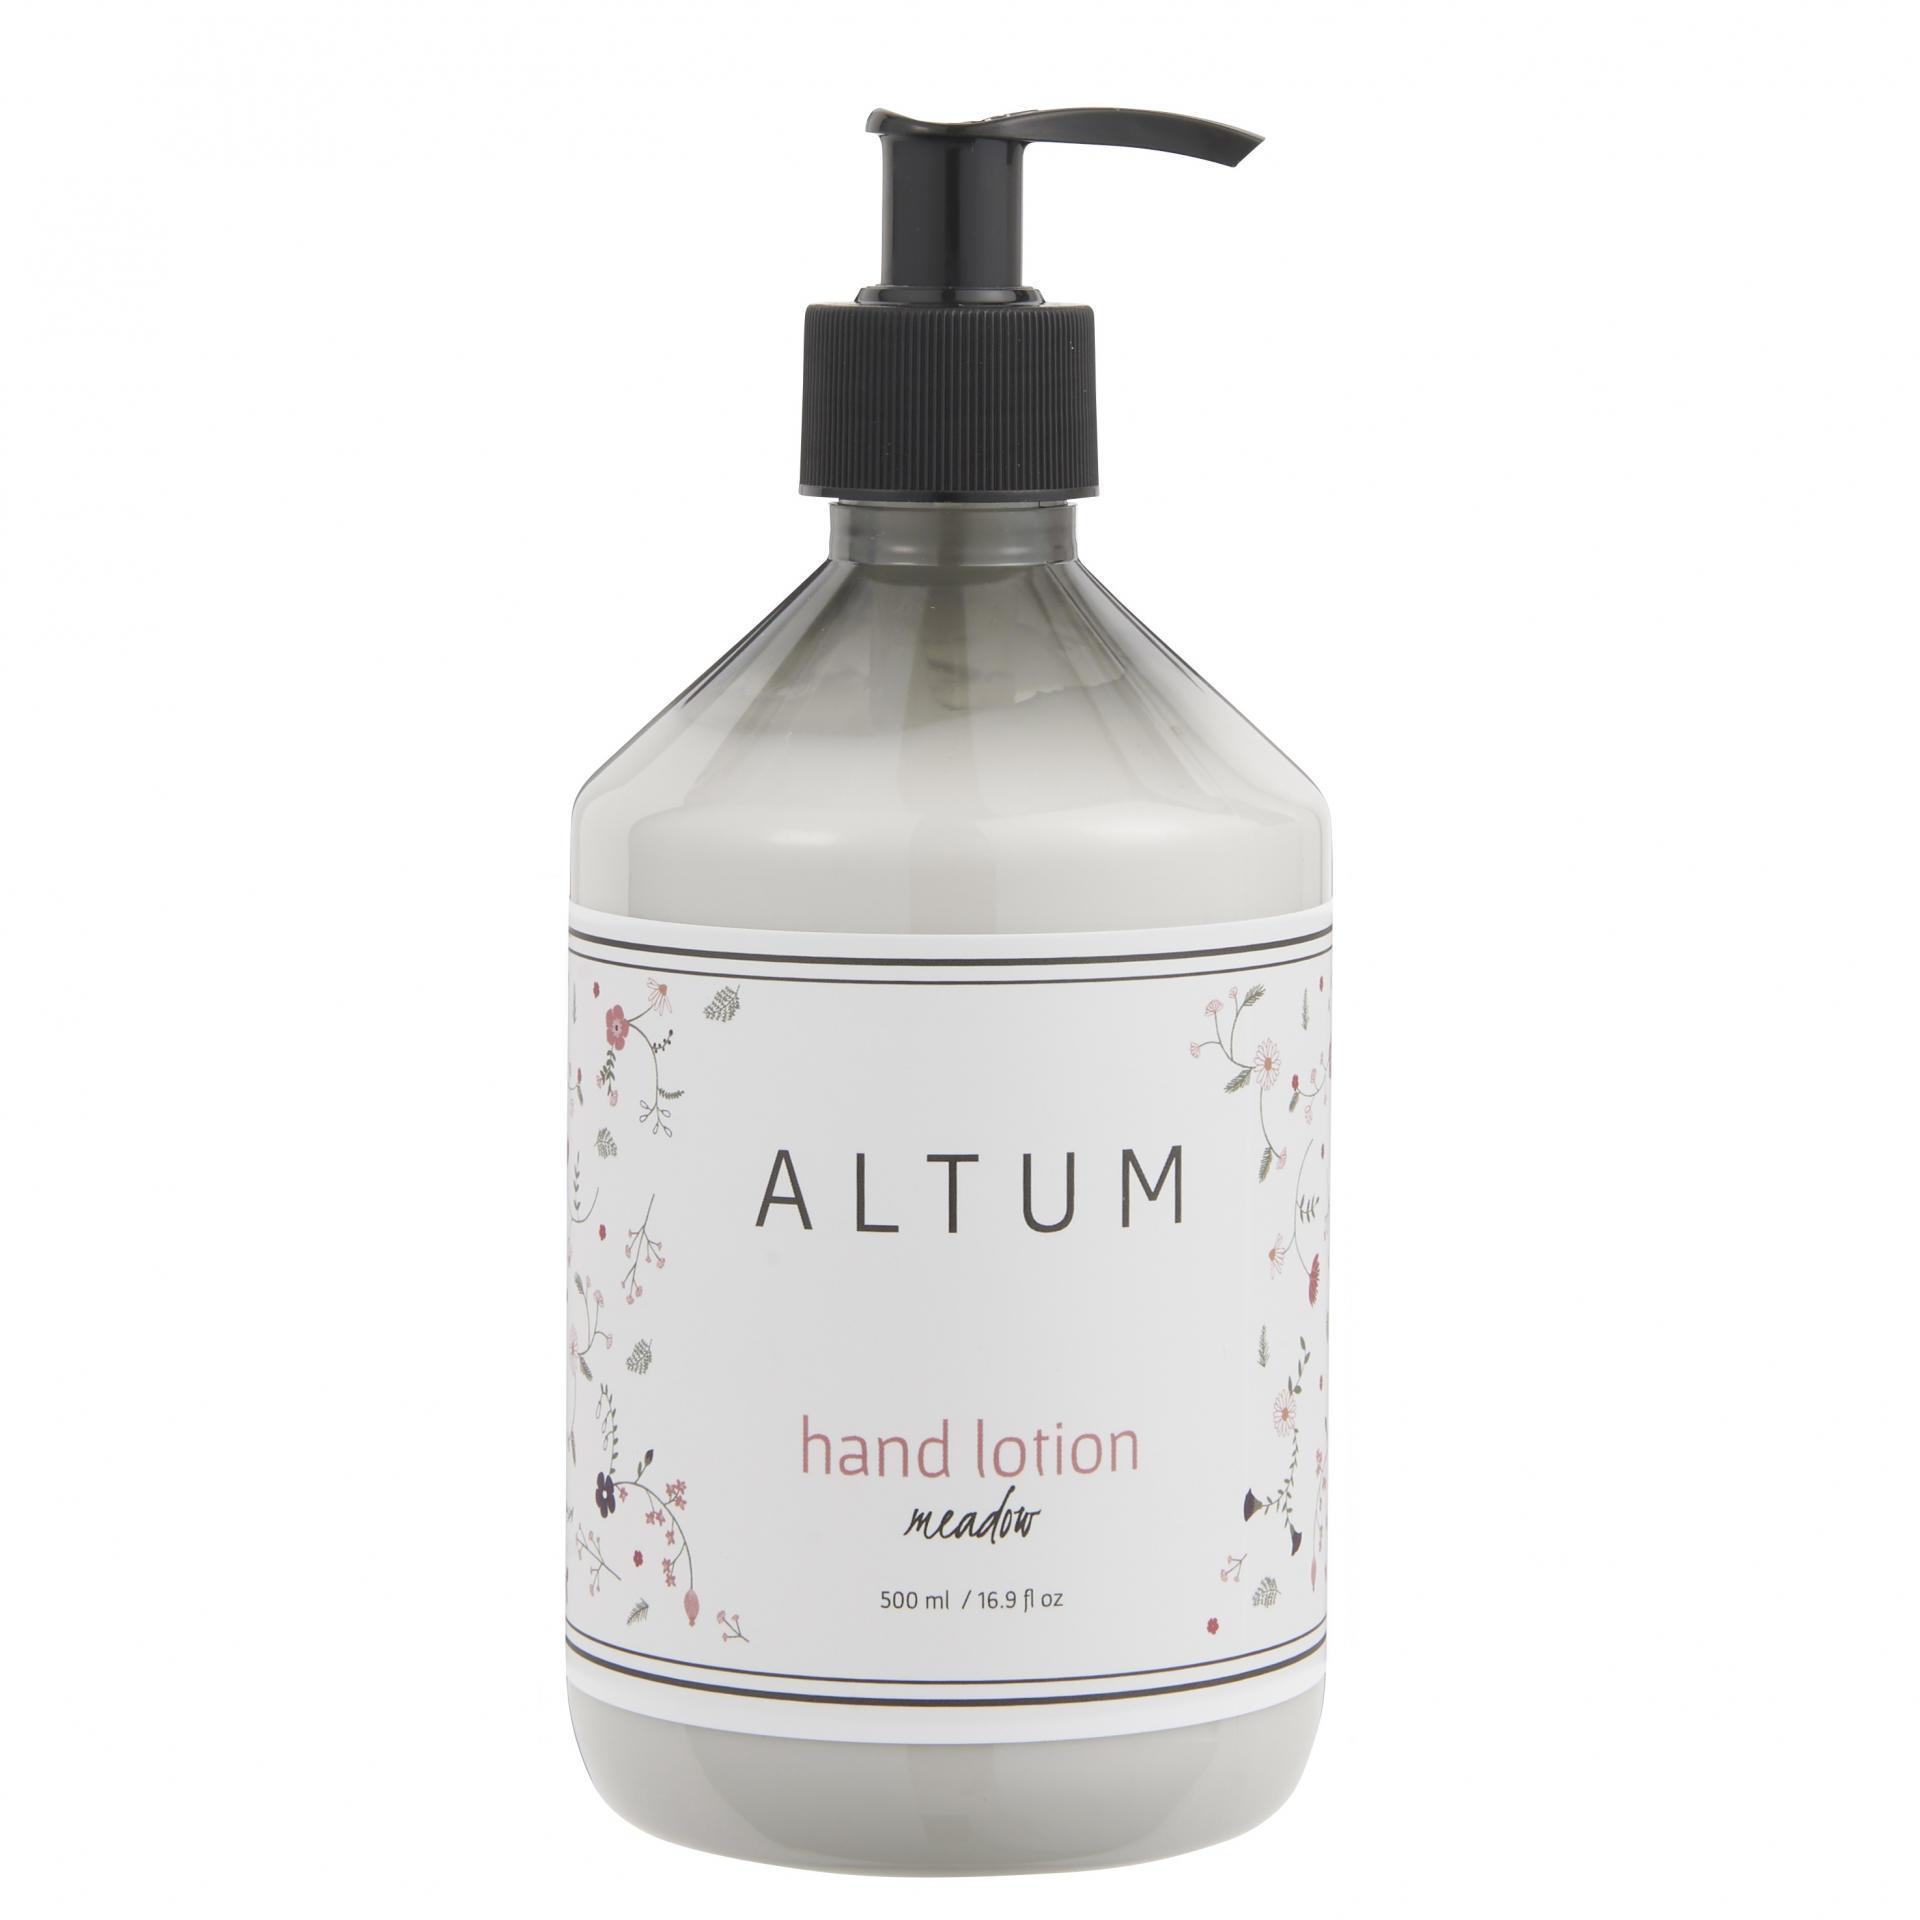 IB LAURSEN Mléko na ruce ALTUM - Meadow 500 ml, šedá barva, bílá barva, plast